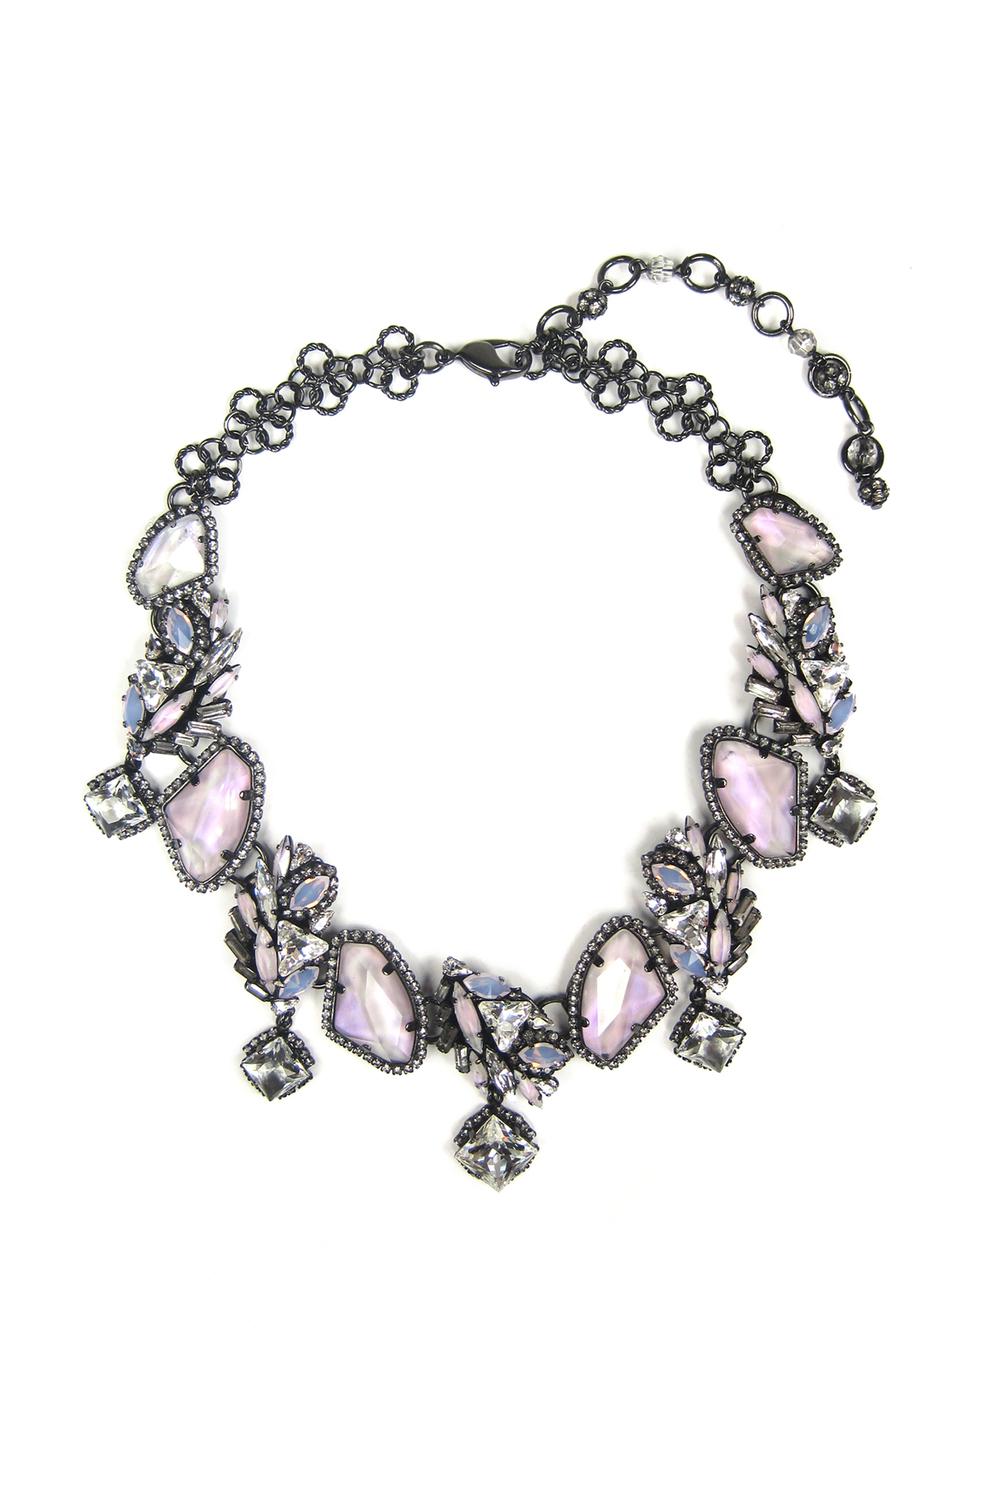 01-08-accessories-trends-fall-2015-estate-jewelry.jpg